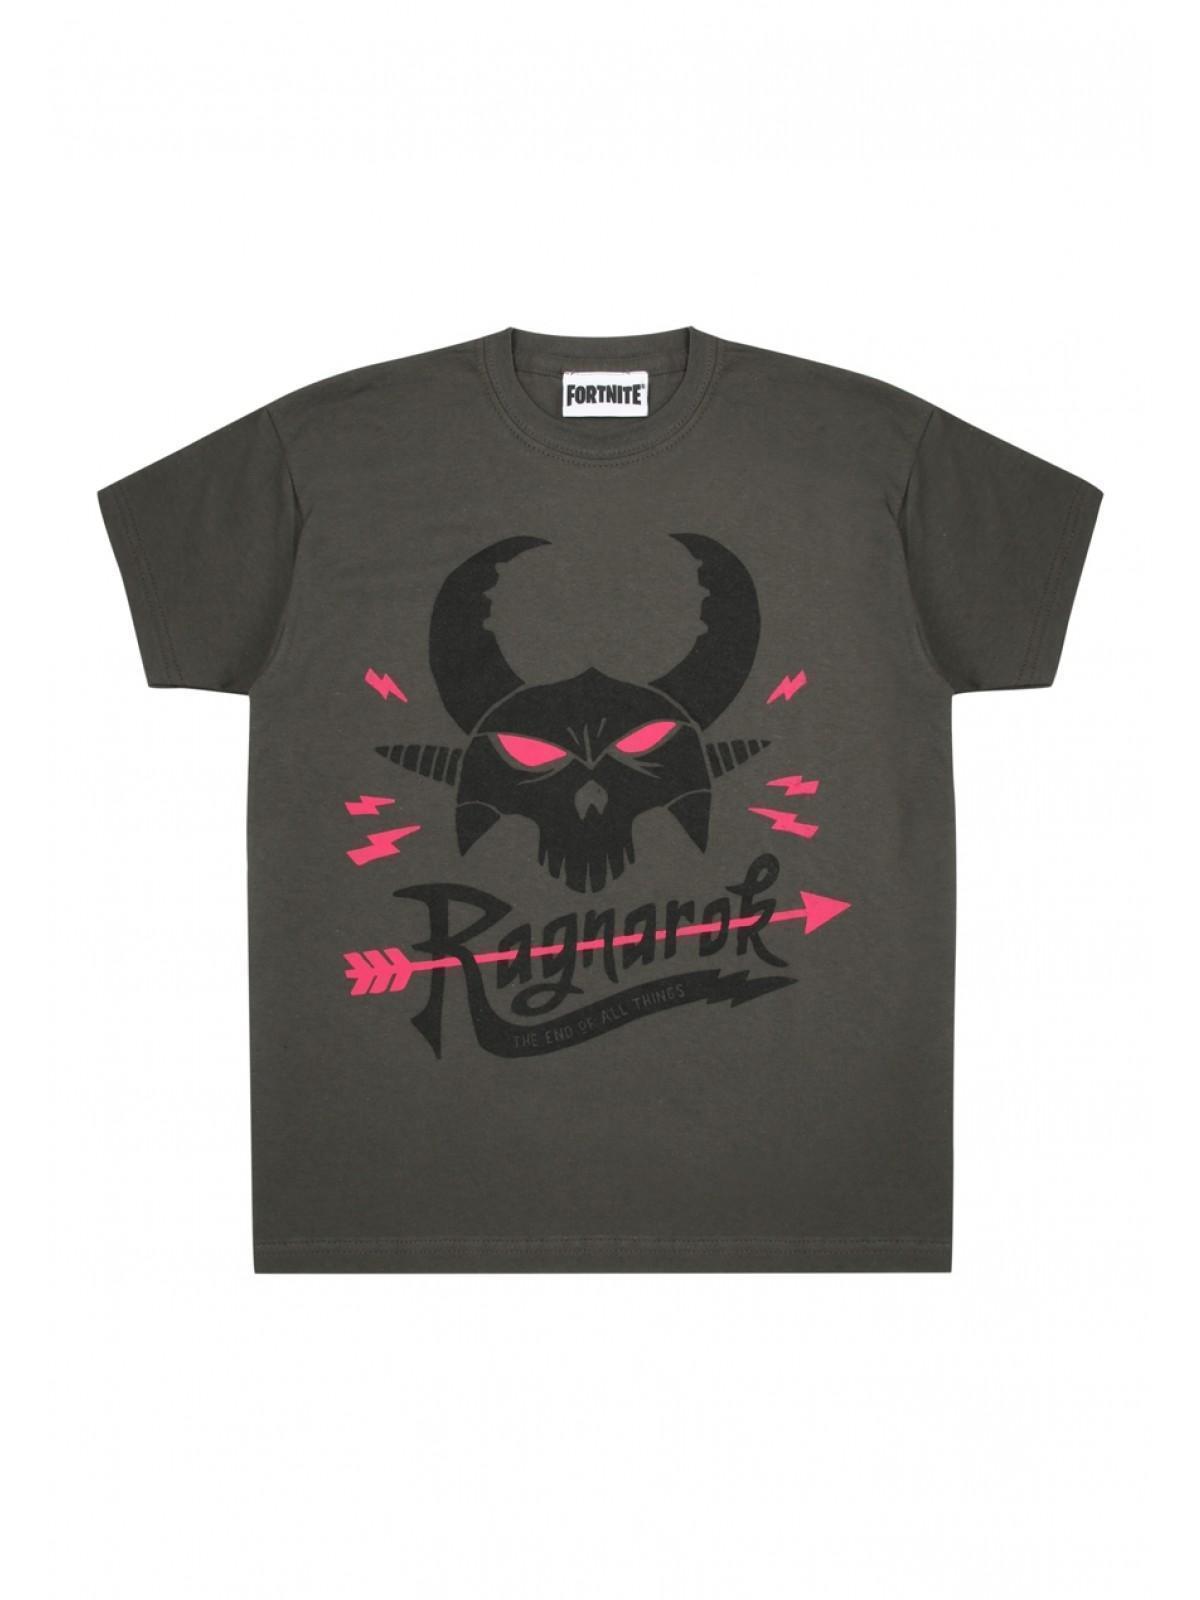 552e682dd Home; Older Boys Charcoal Fortnite Ragnarok T-shirt. Back. PreviousNext